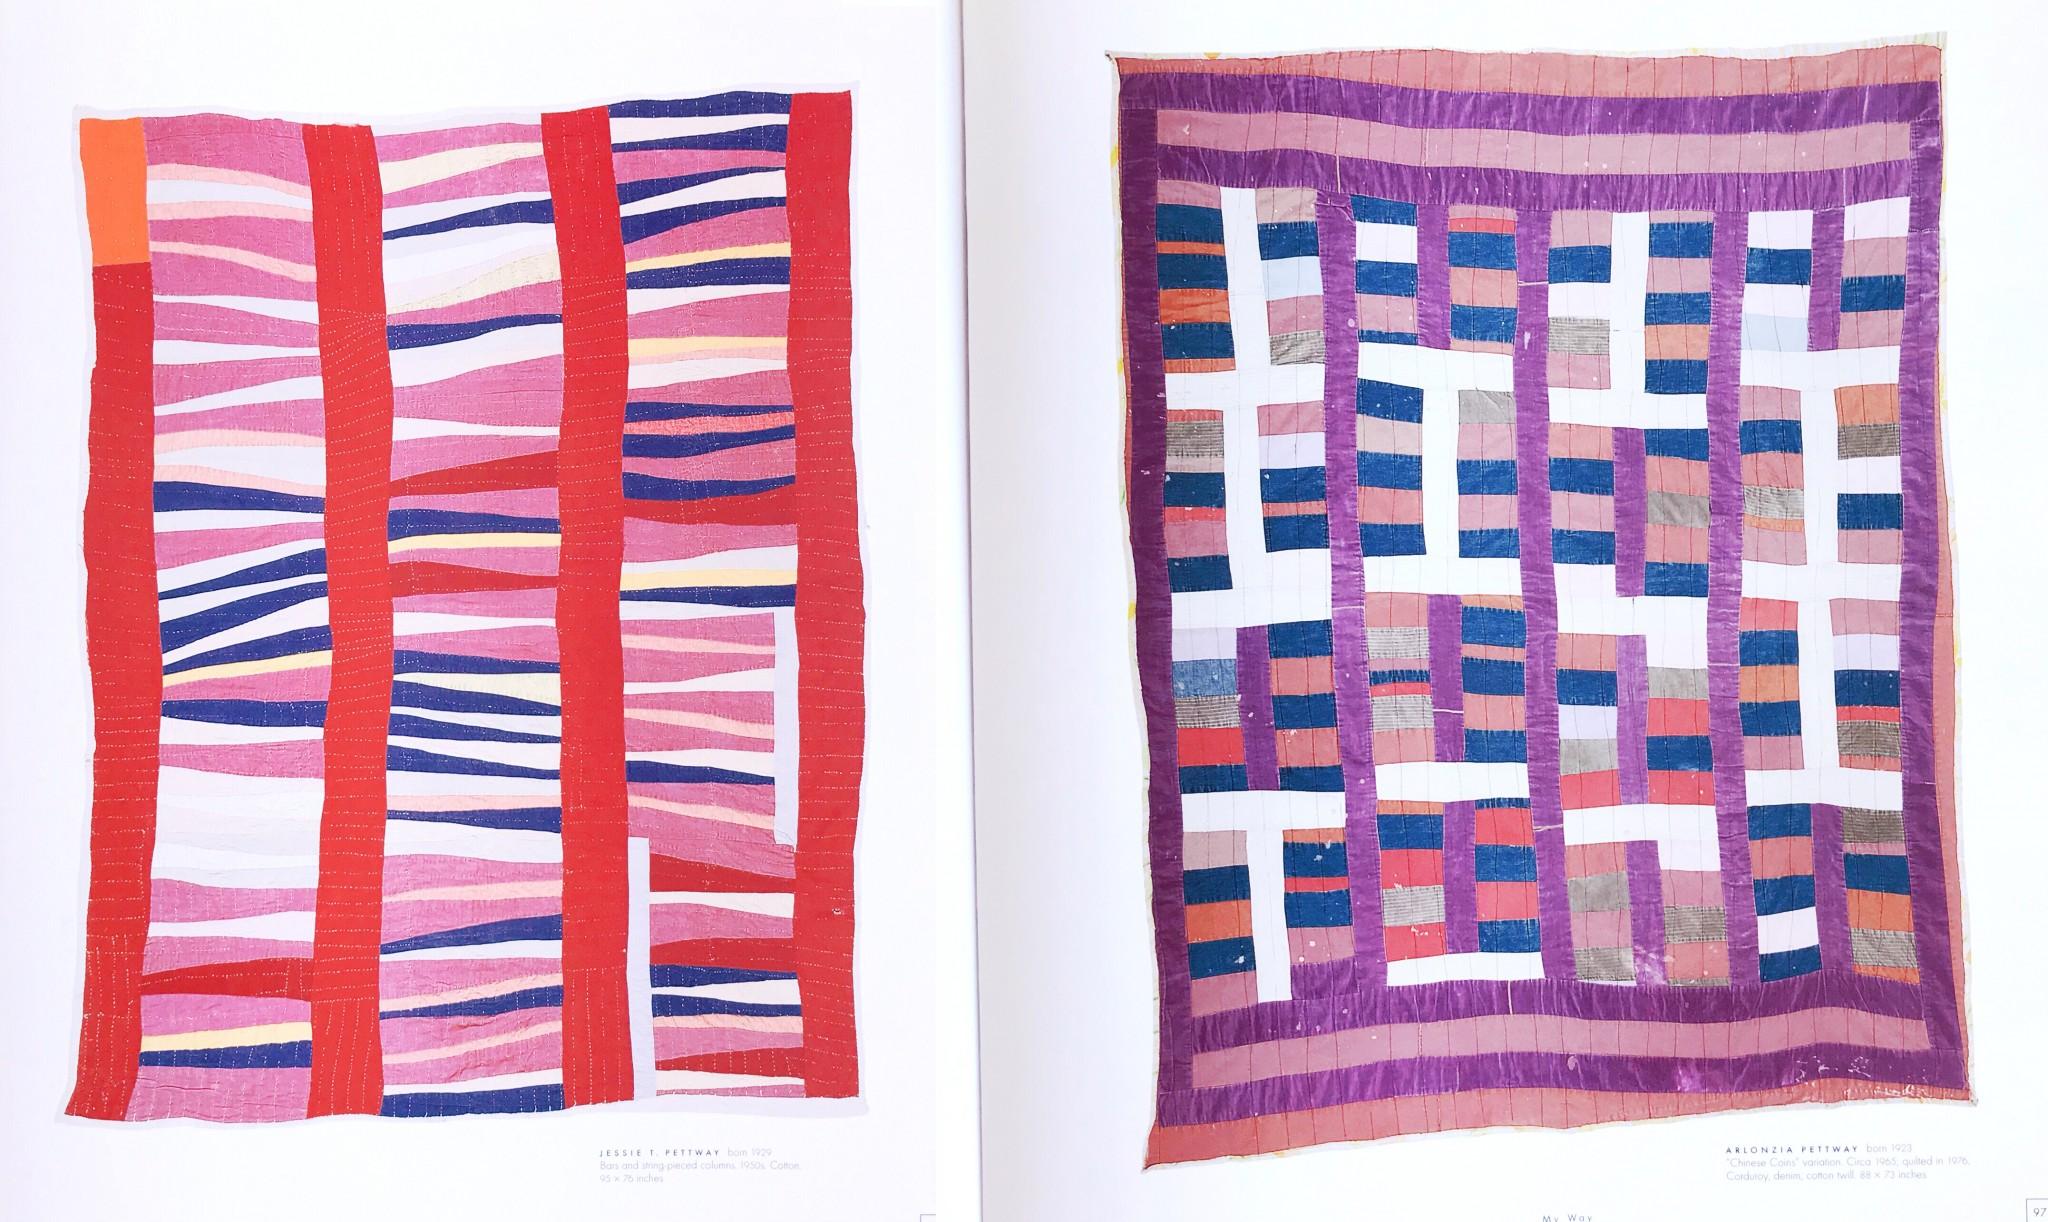 Quilts by Jessie T. Pettway and Arlonzia Pettway